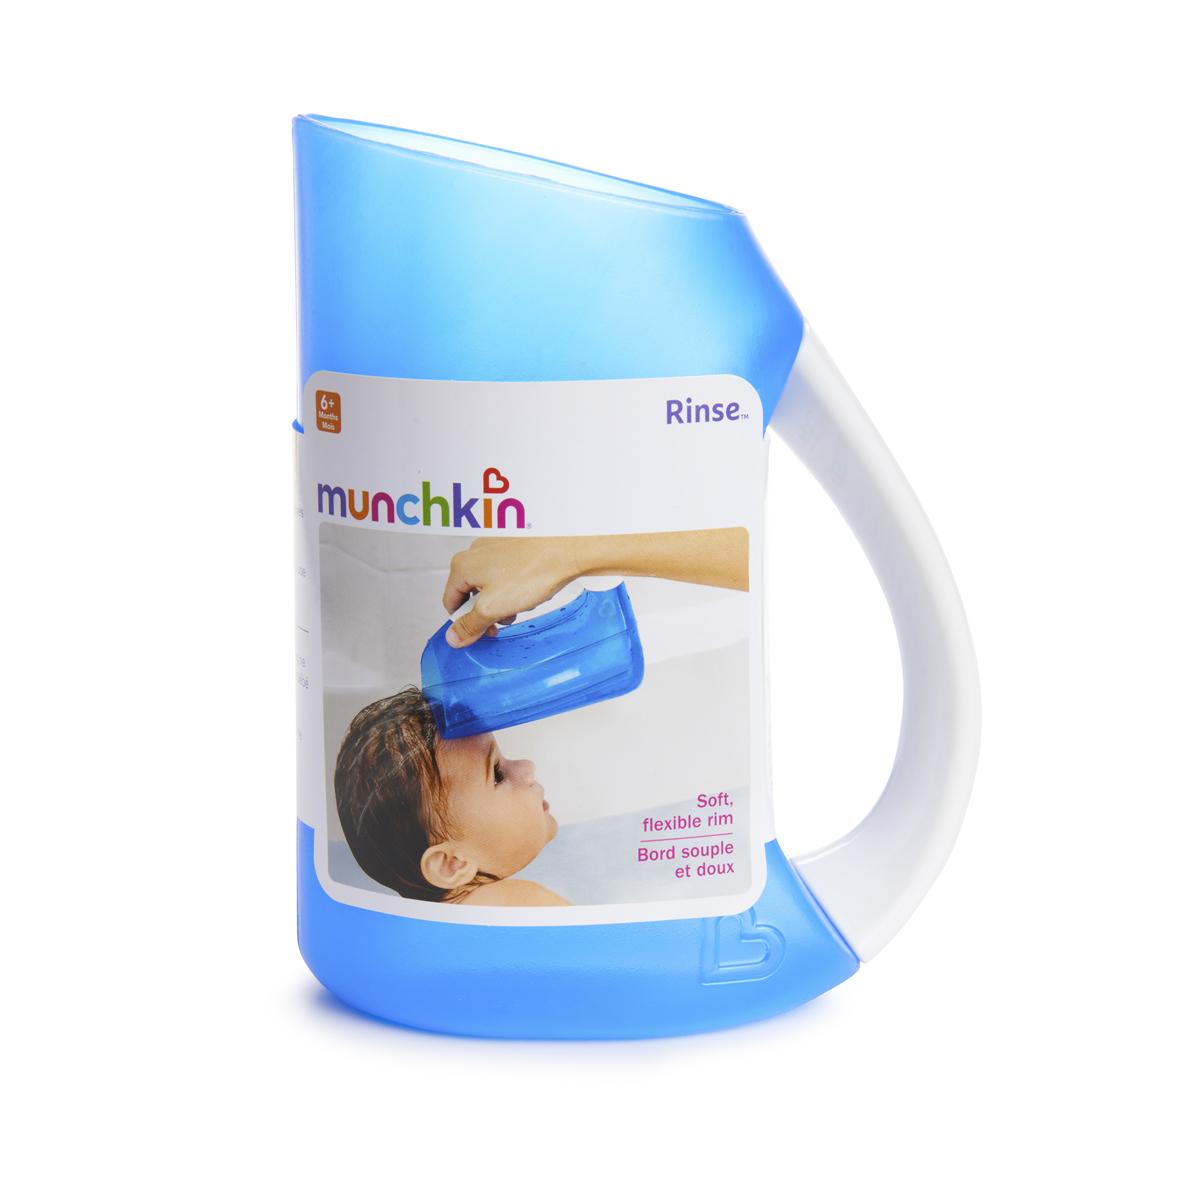 Munchkin Kids Soft Rim Flexi Tear-free Bath Time Shampoo Rinser Child Cup Blue